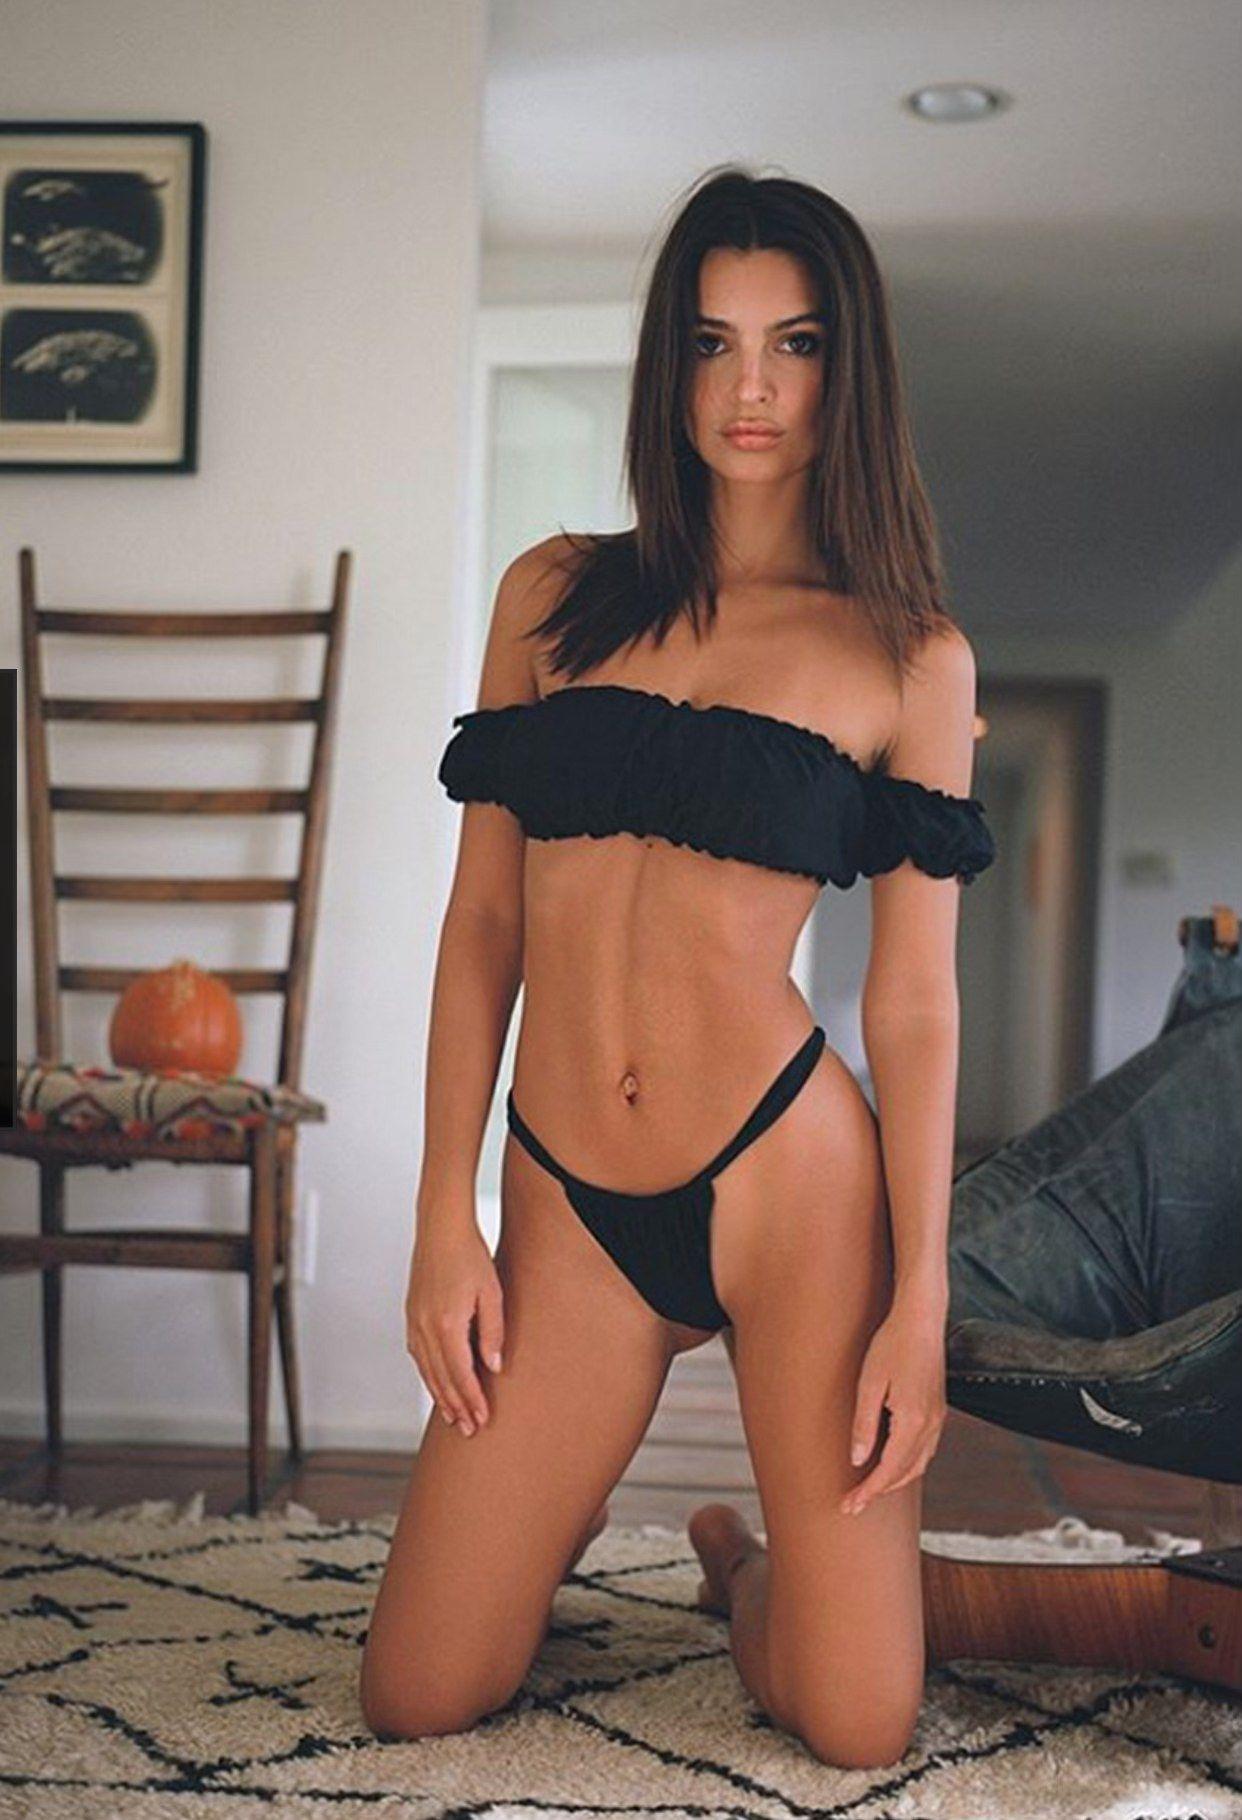 Pin by Mike sullivan on bikinies | Emily ratajkowski outfits, Swimsuits hot, Emily ratajkowski